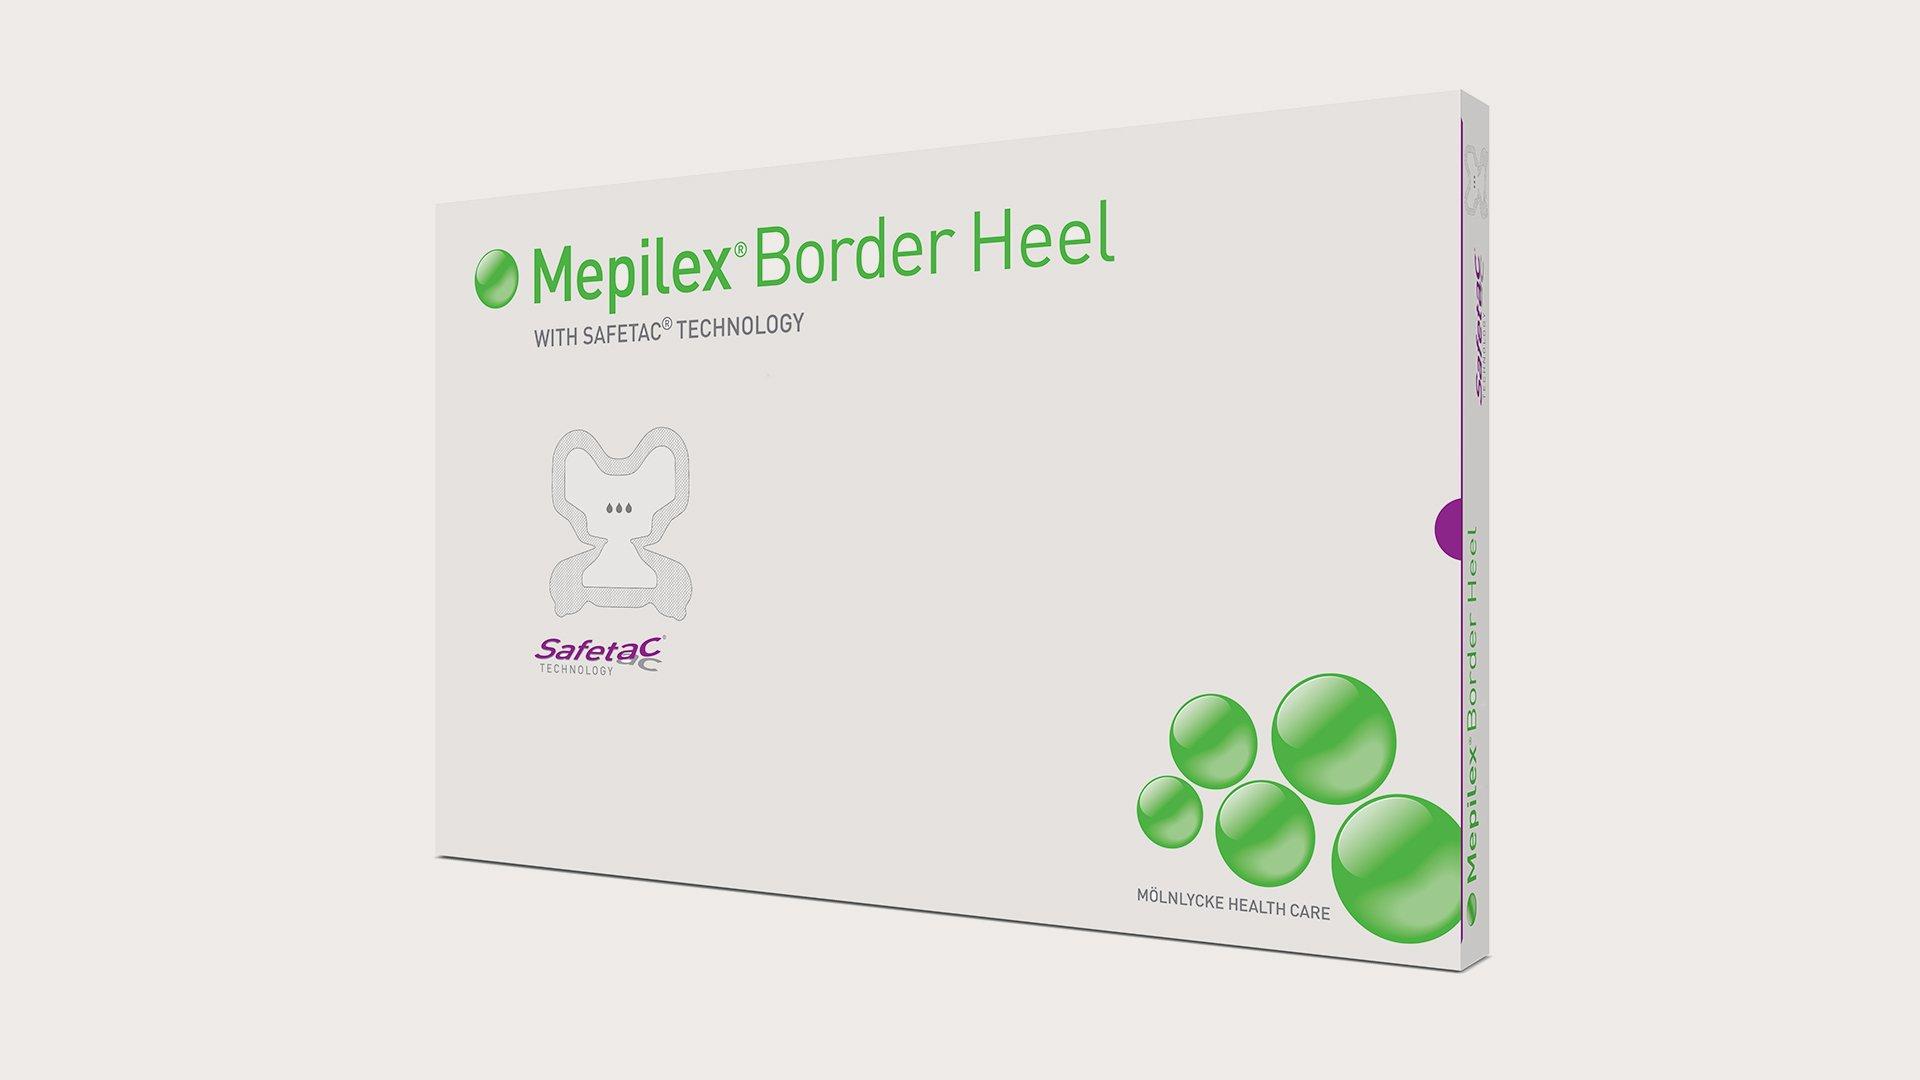 Mepilex® Border Heel image